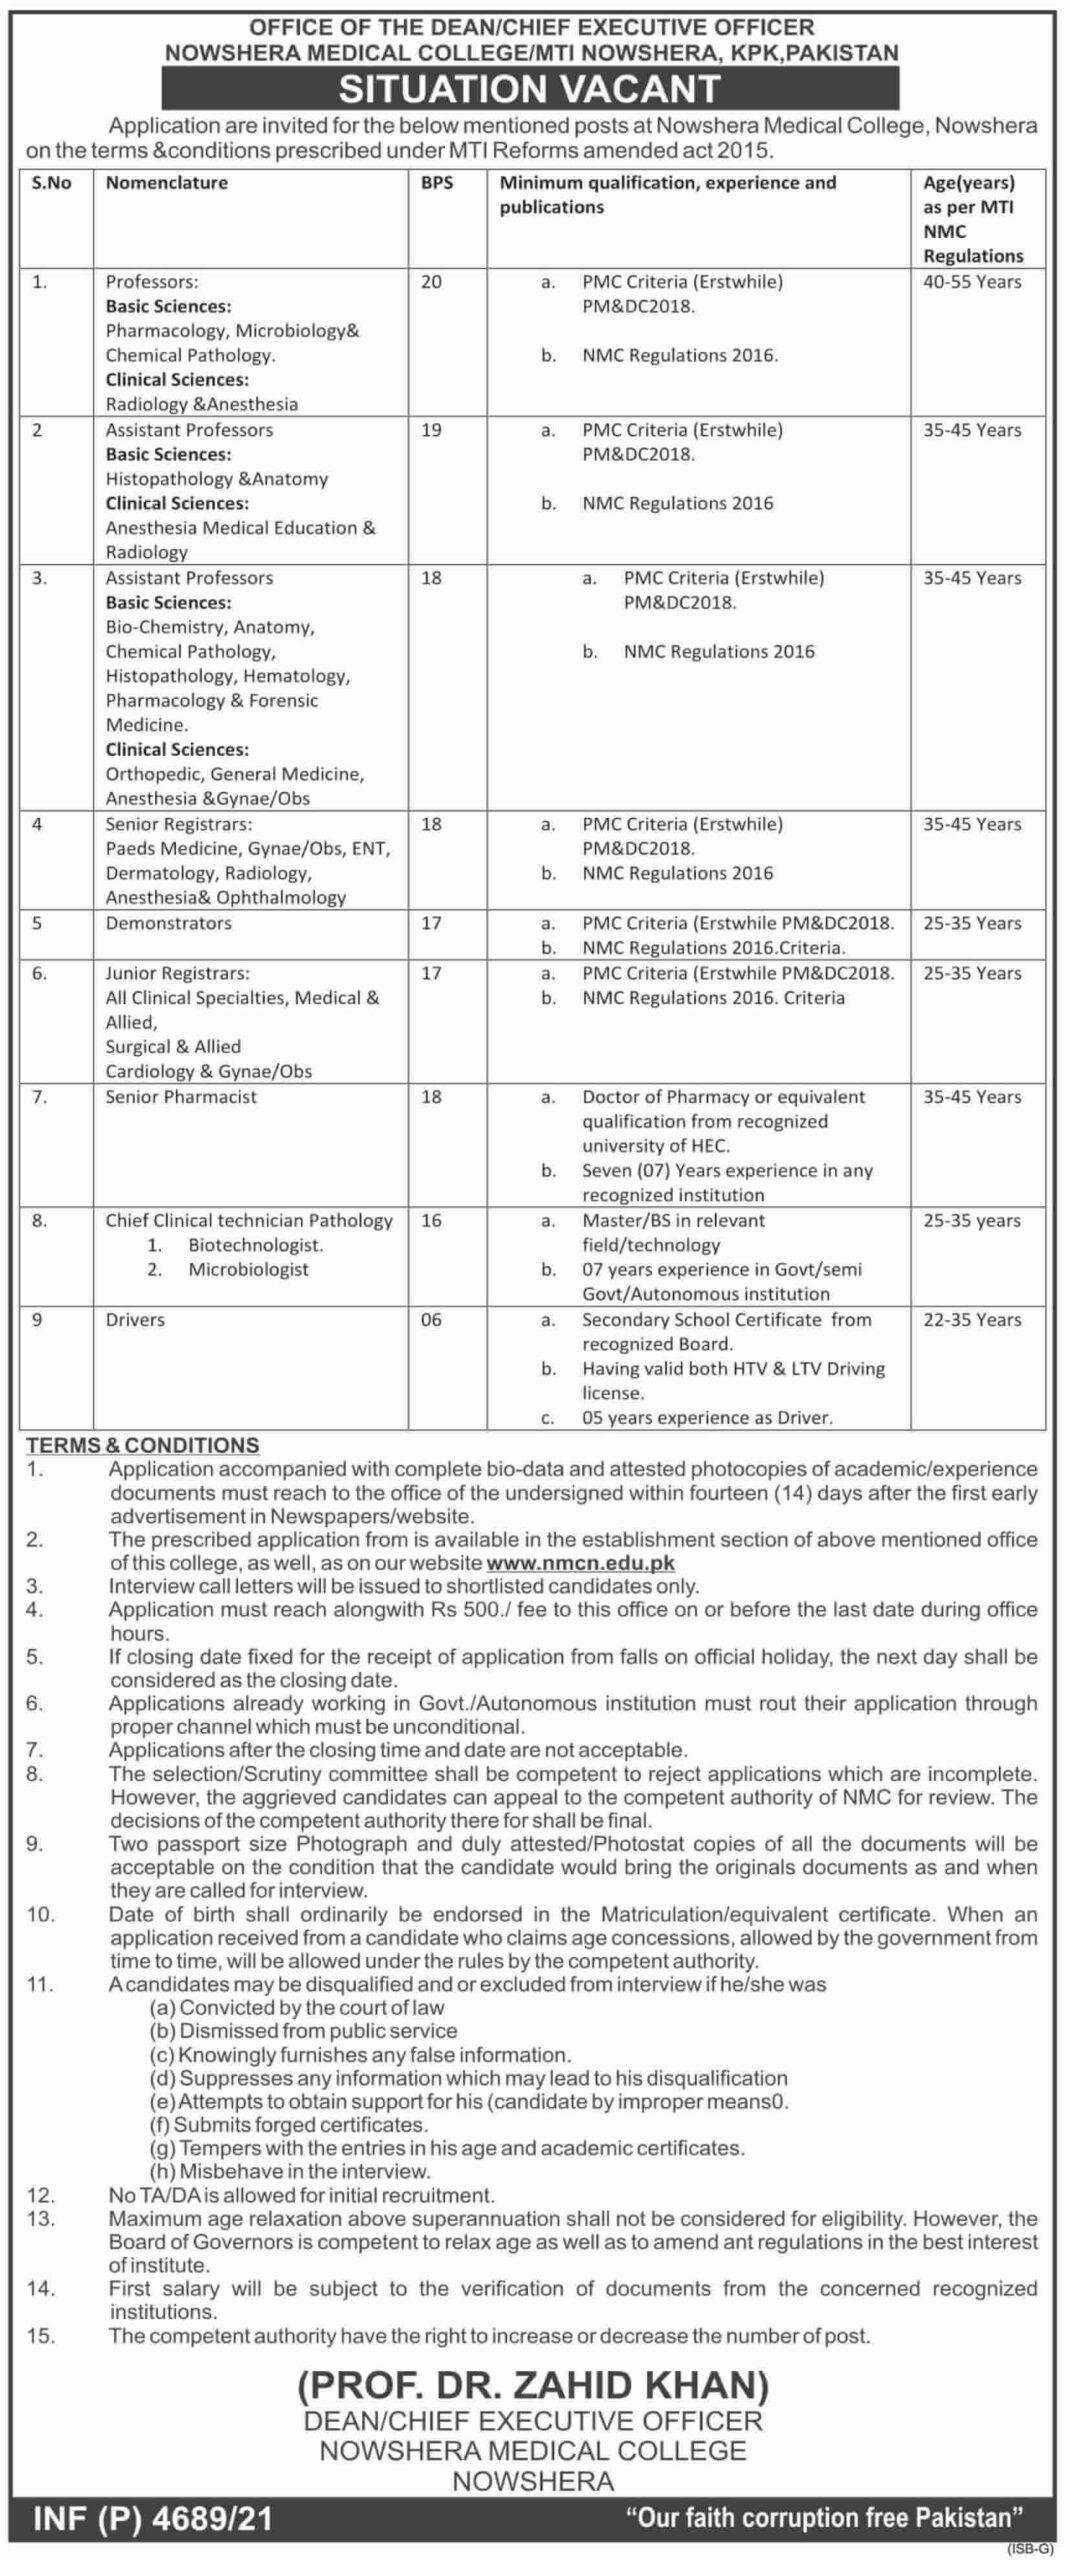 KPK Govt Jobs 2021 At KPK Civil Defence Tevta KPK & Nowshera Medical College